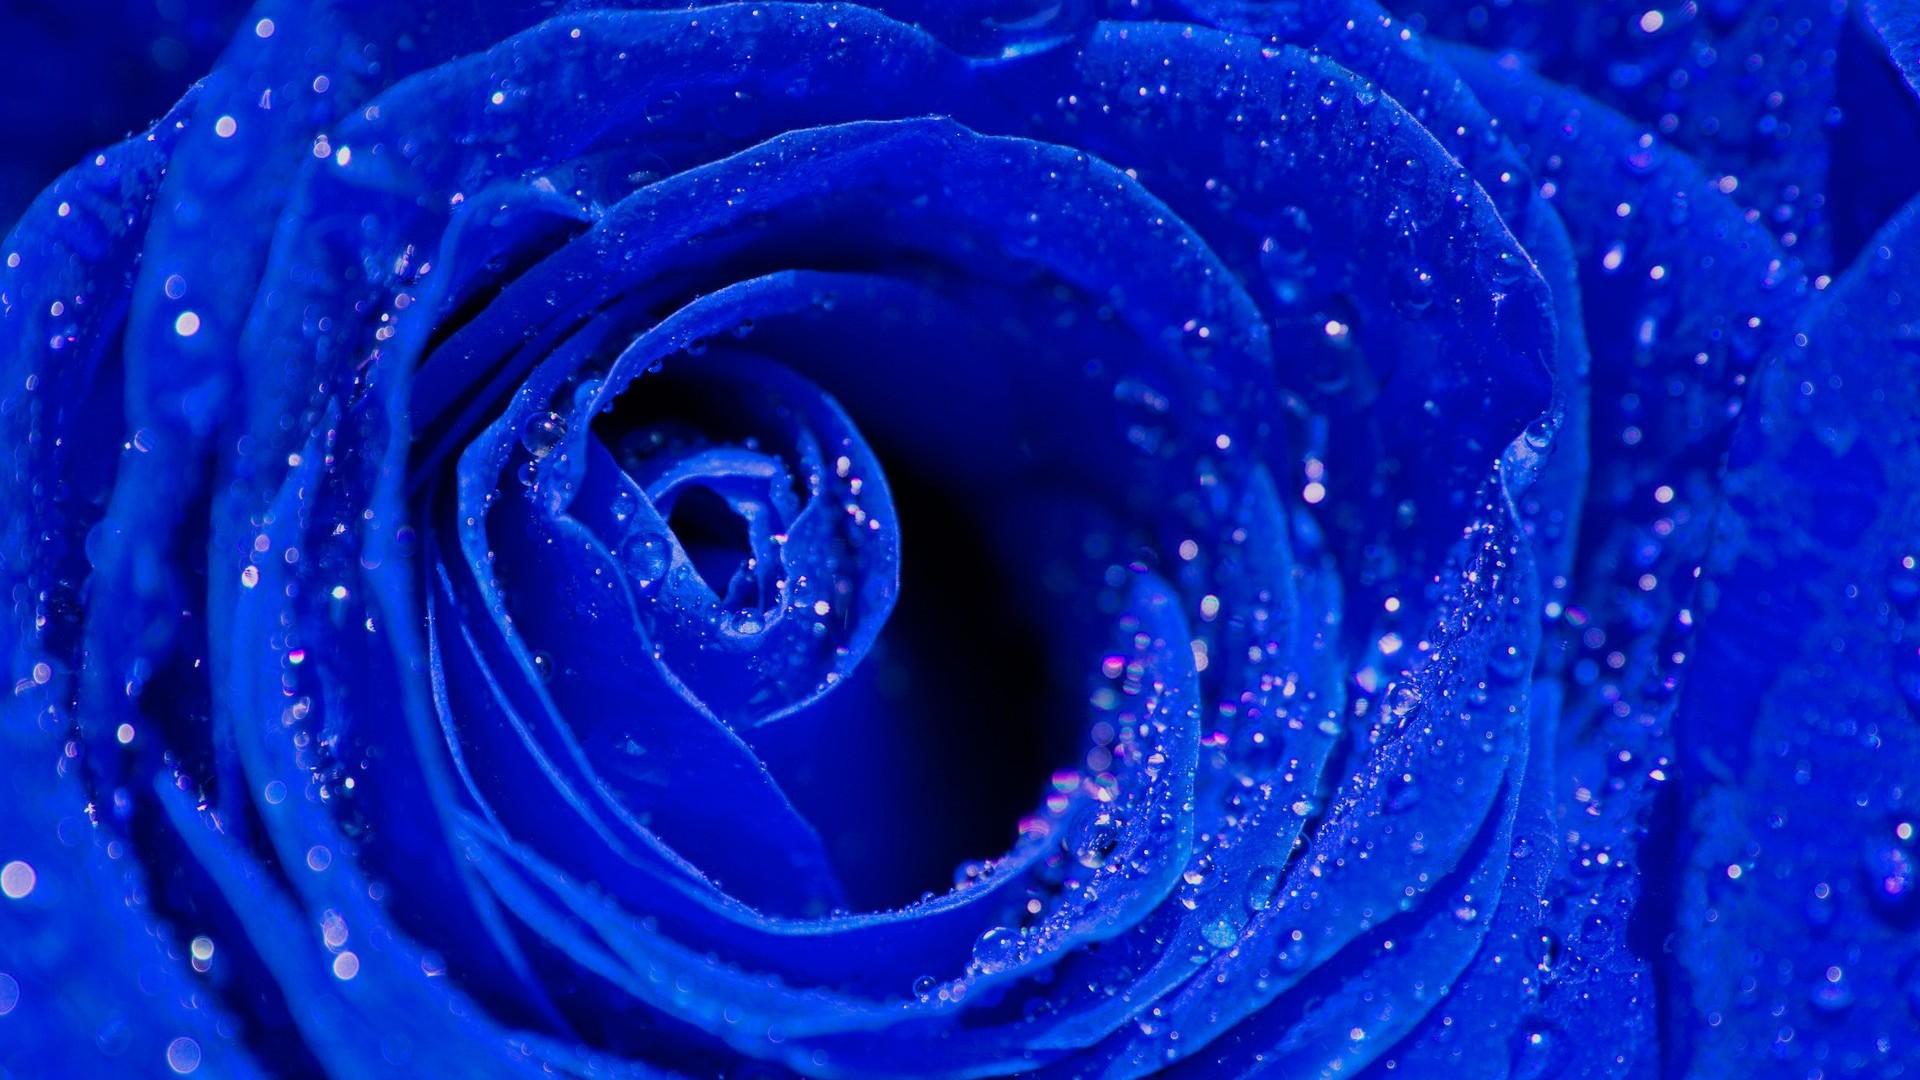 картинки на рабочий стол синий голубой